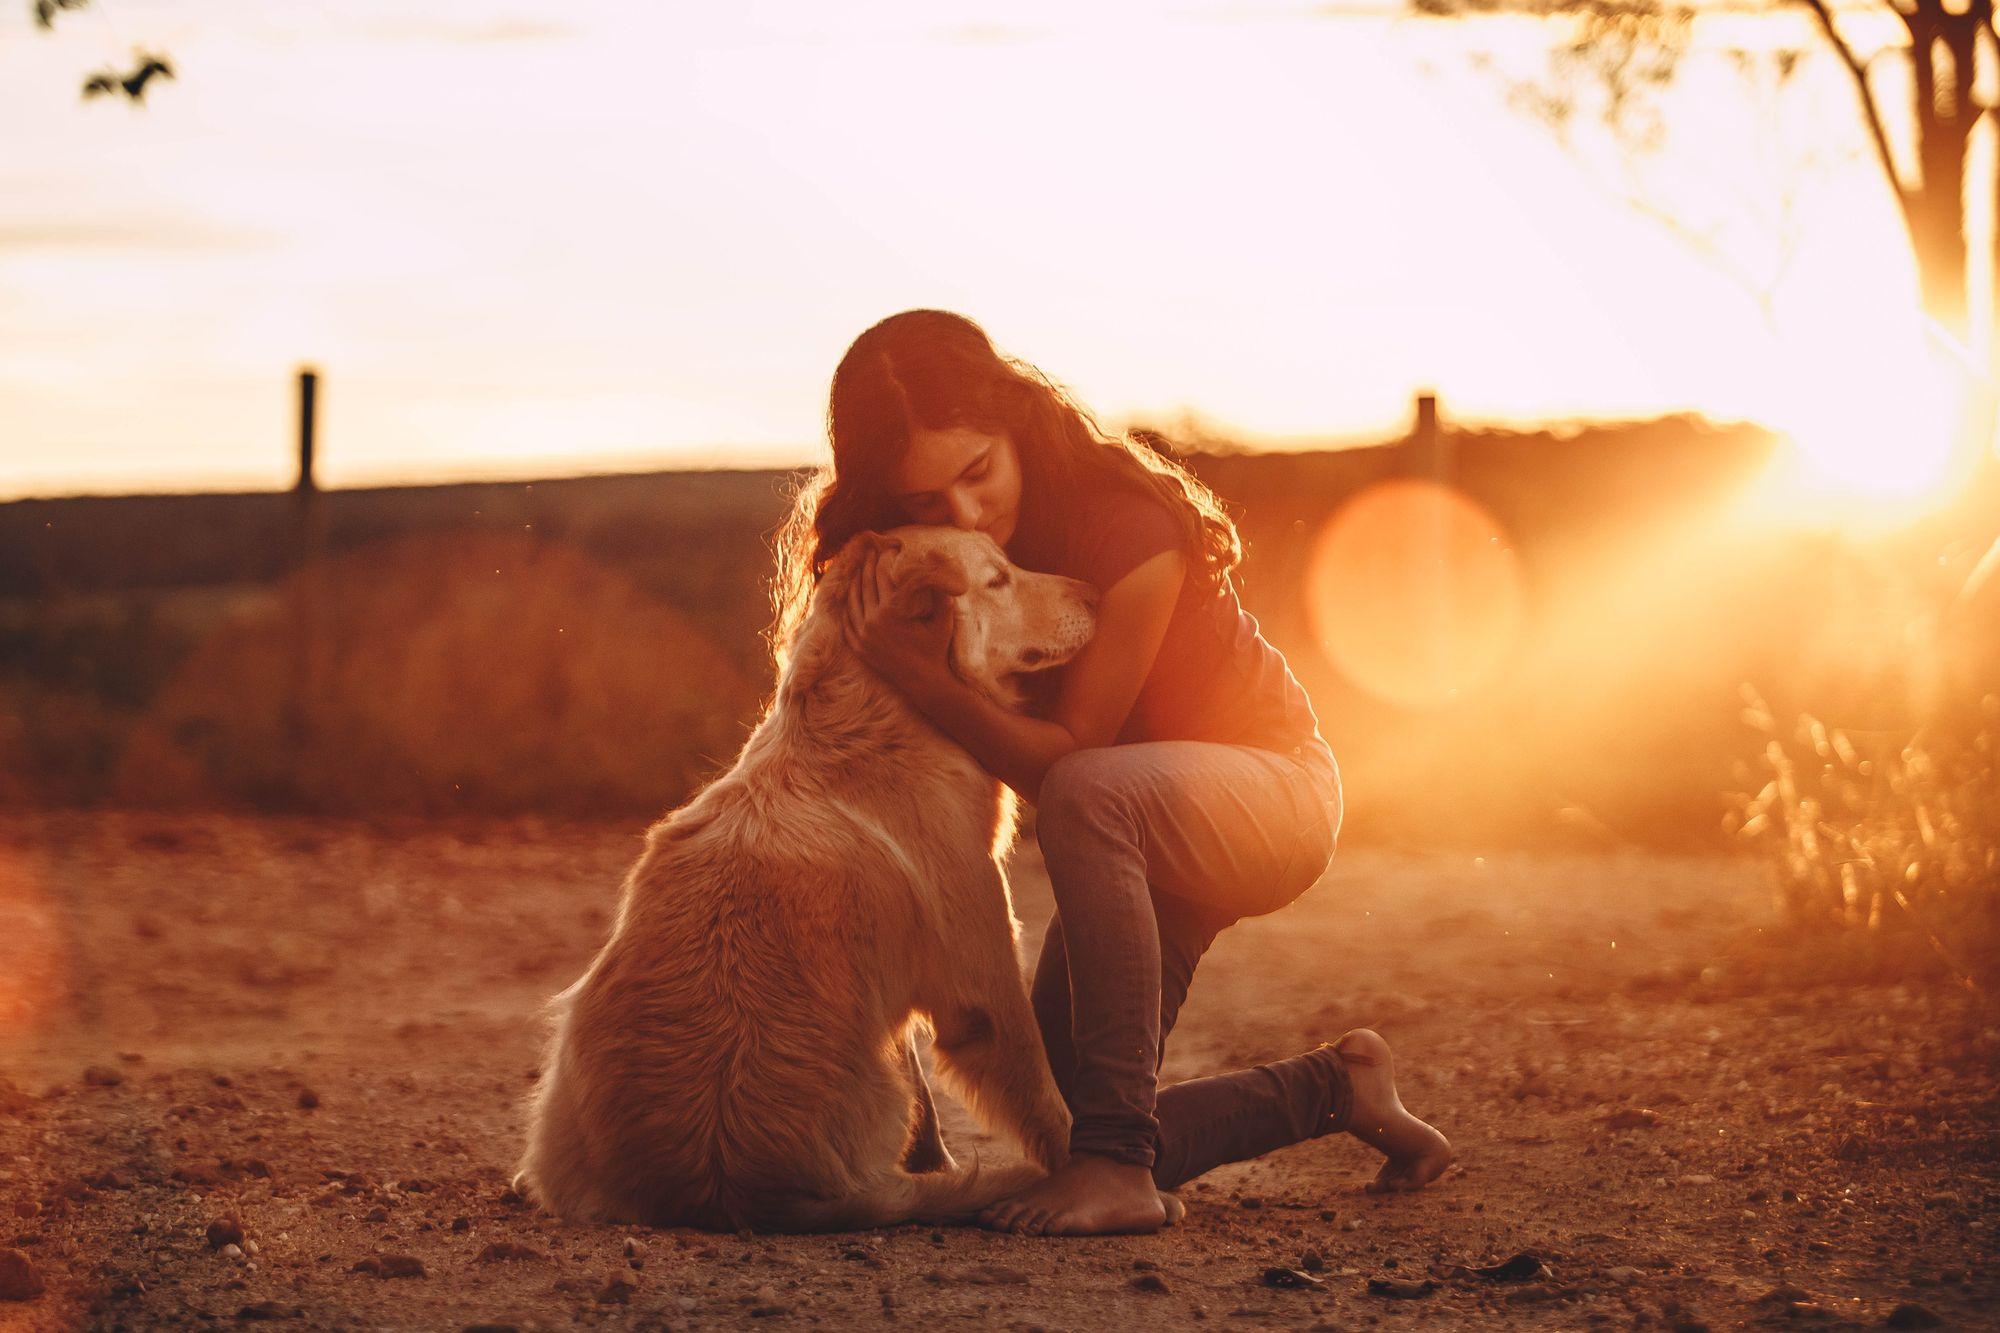 golden-retriever-affectionate-dog-breed-unsplash-source